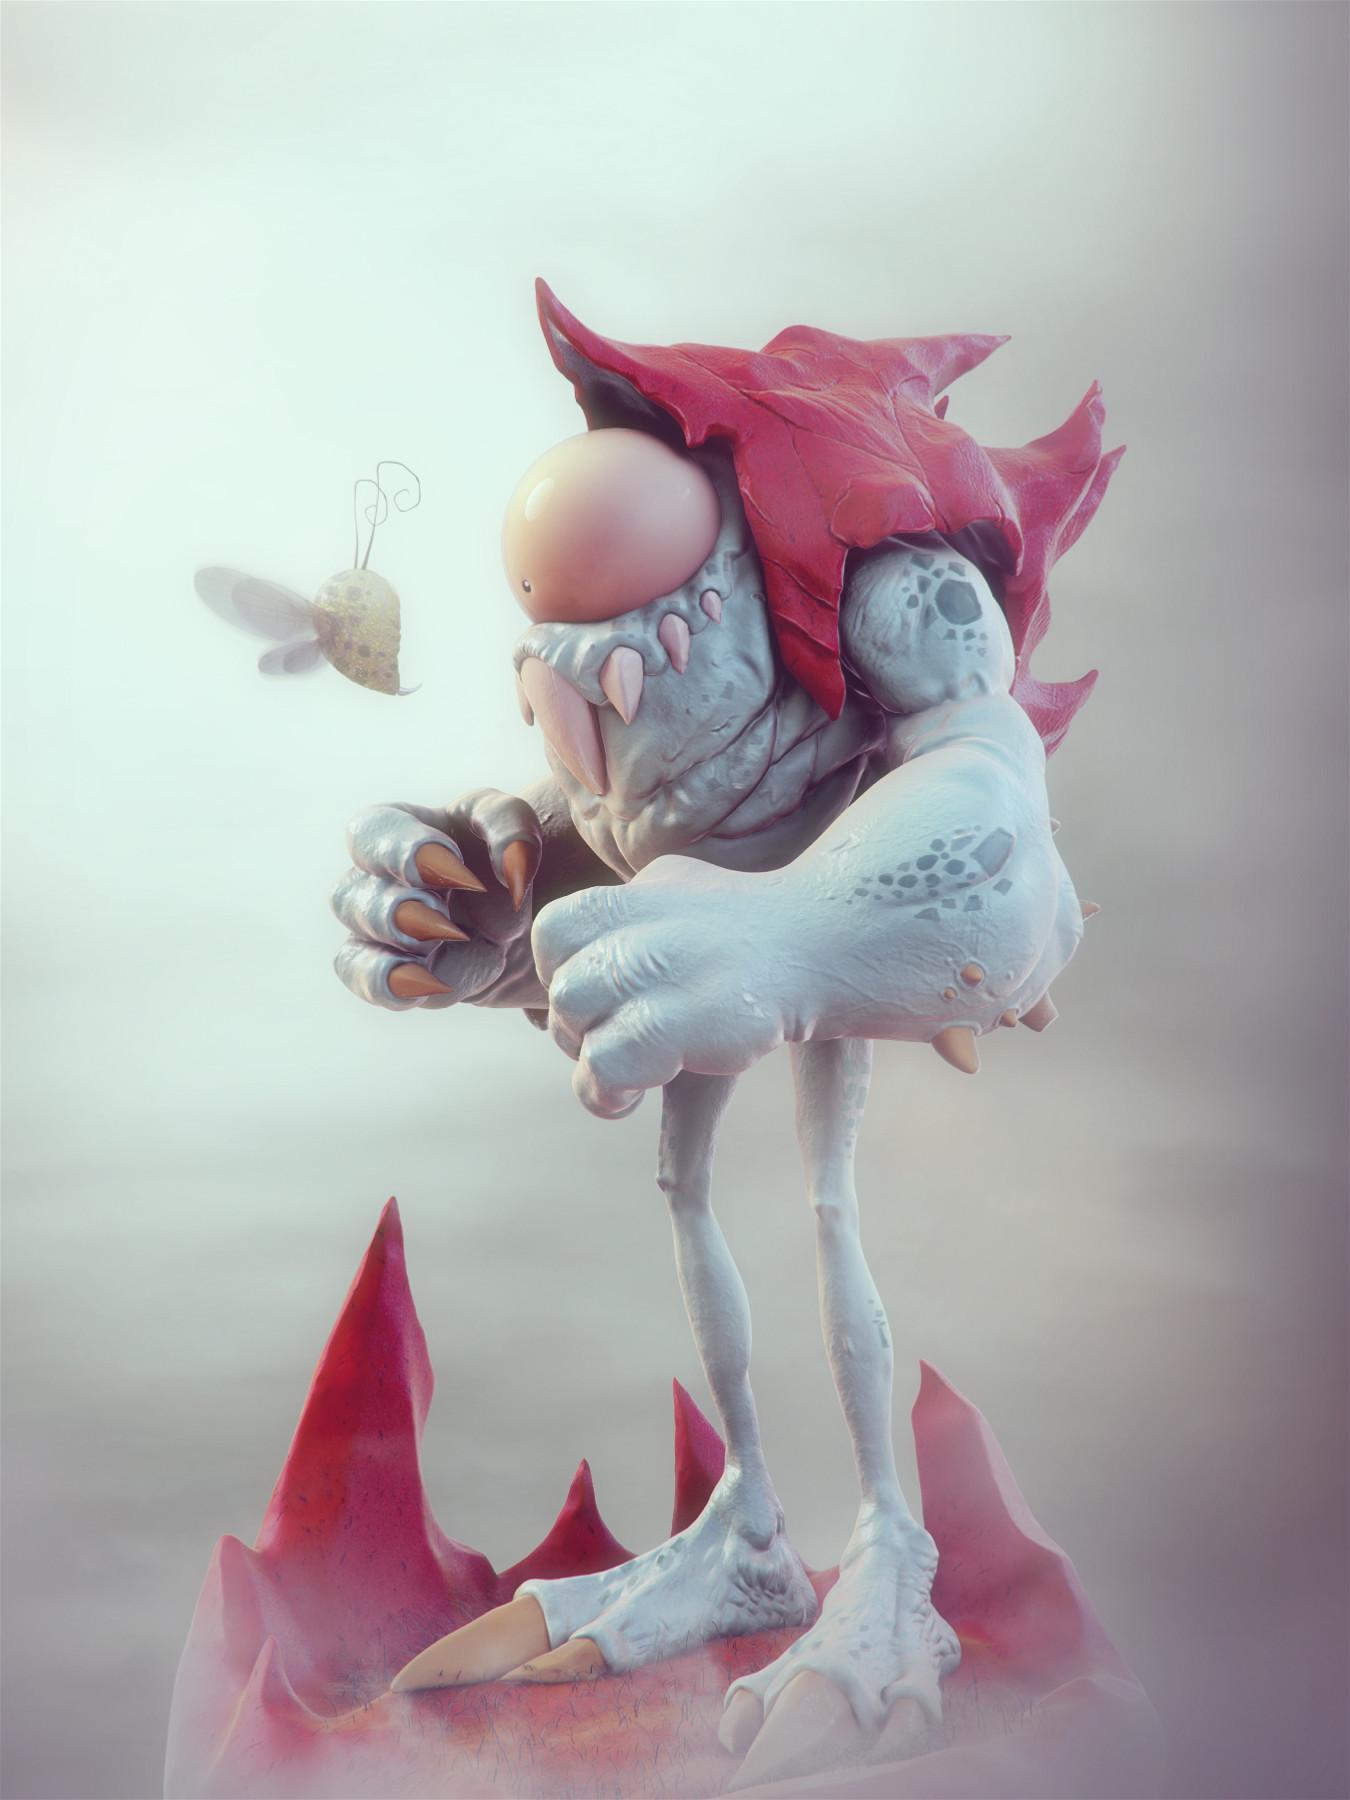 Rakan khamash final render creature 00000